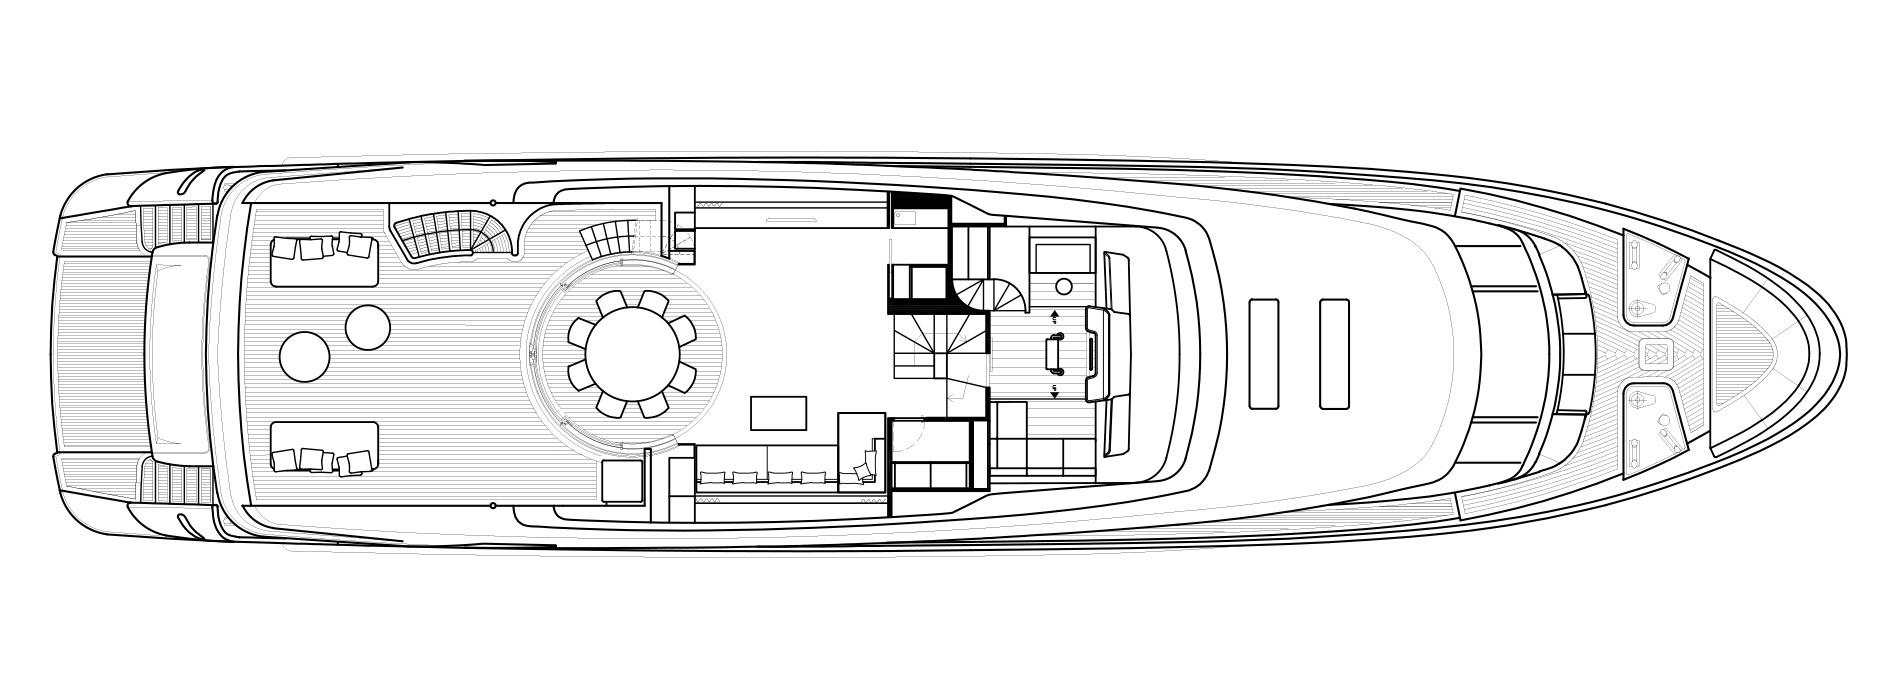 Sanlorenzo Yachts SD112 Pont supérieur Versione B